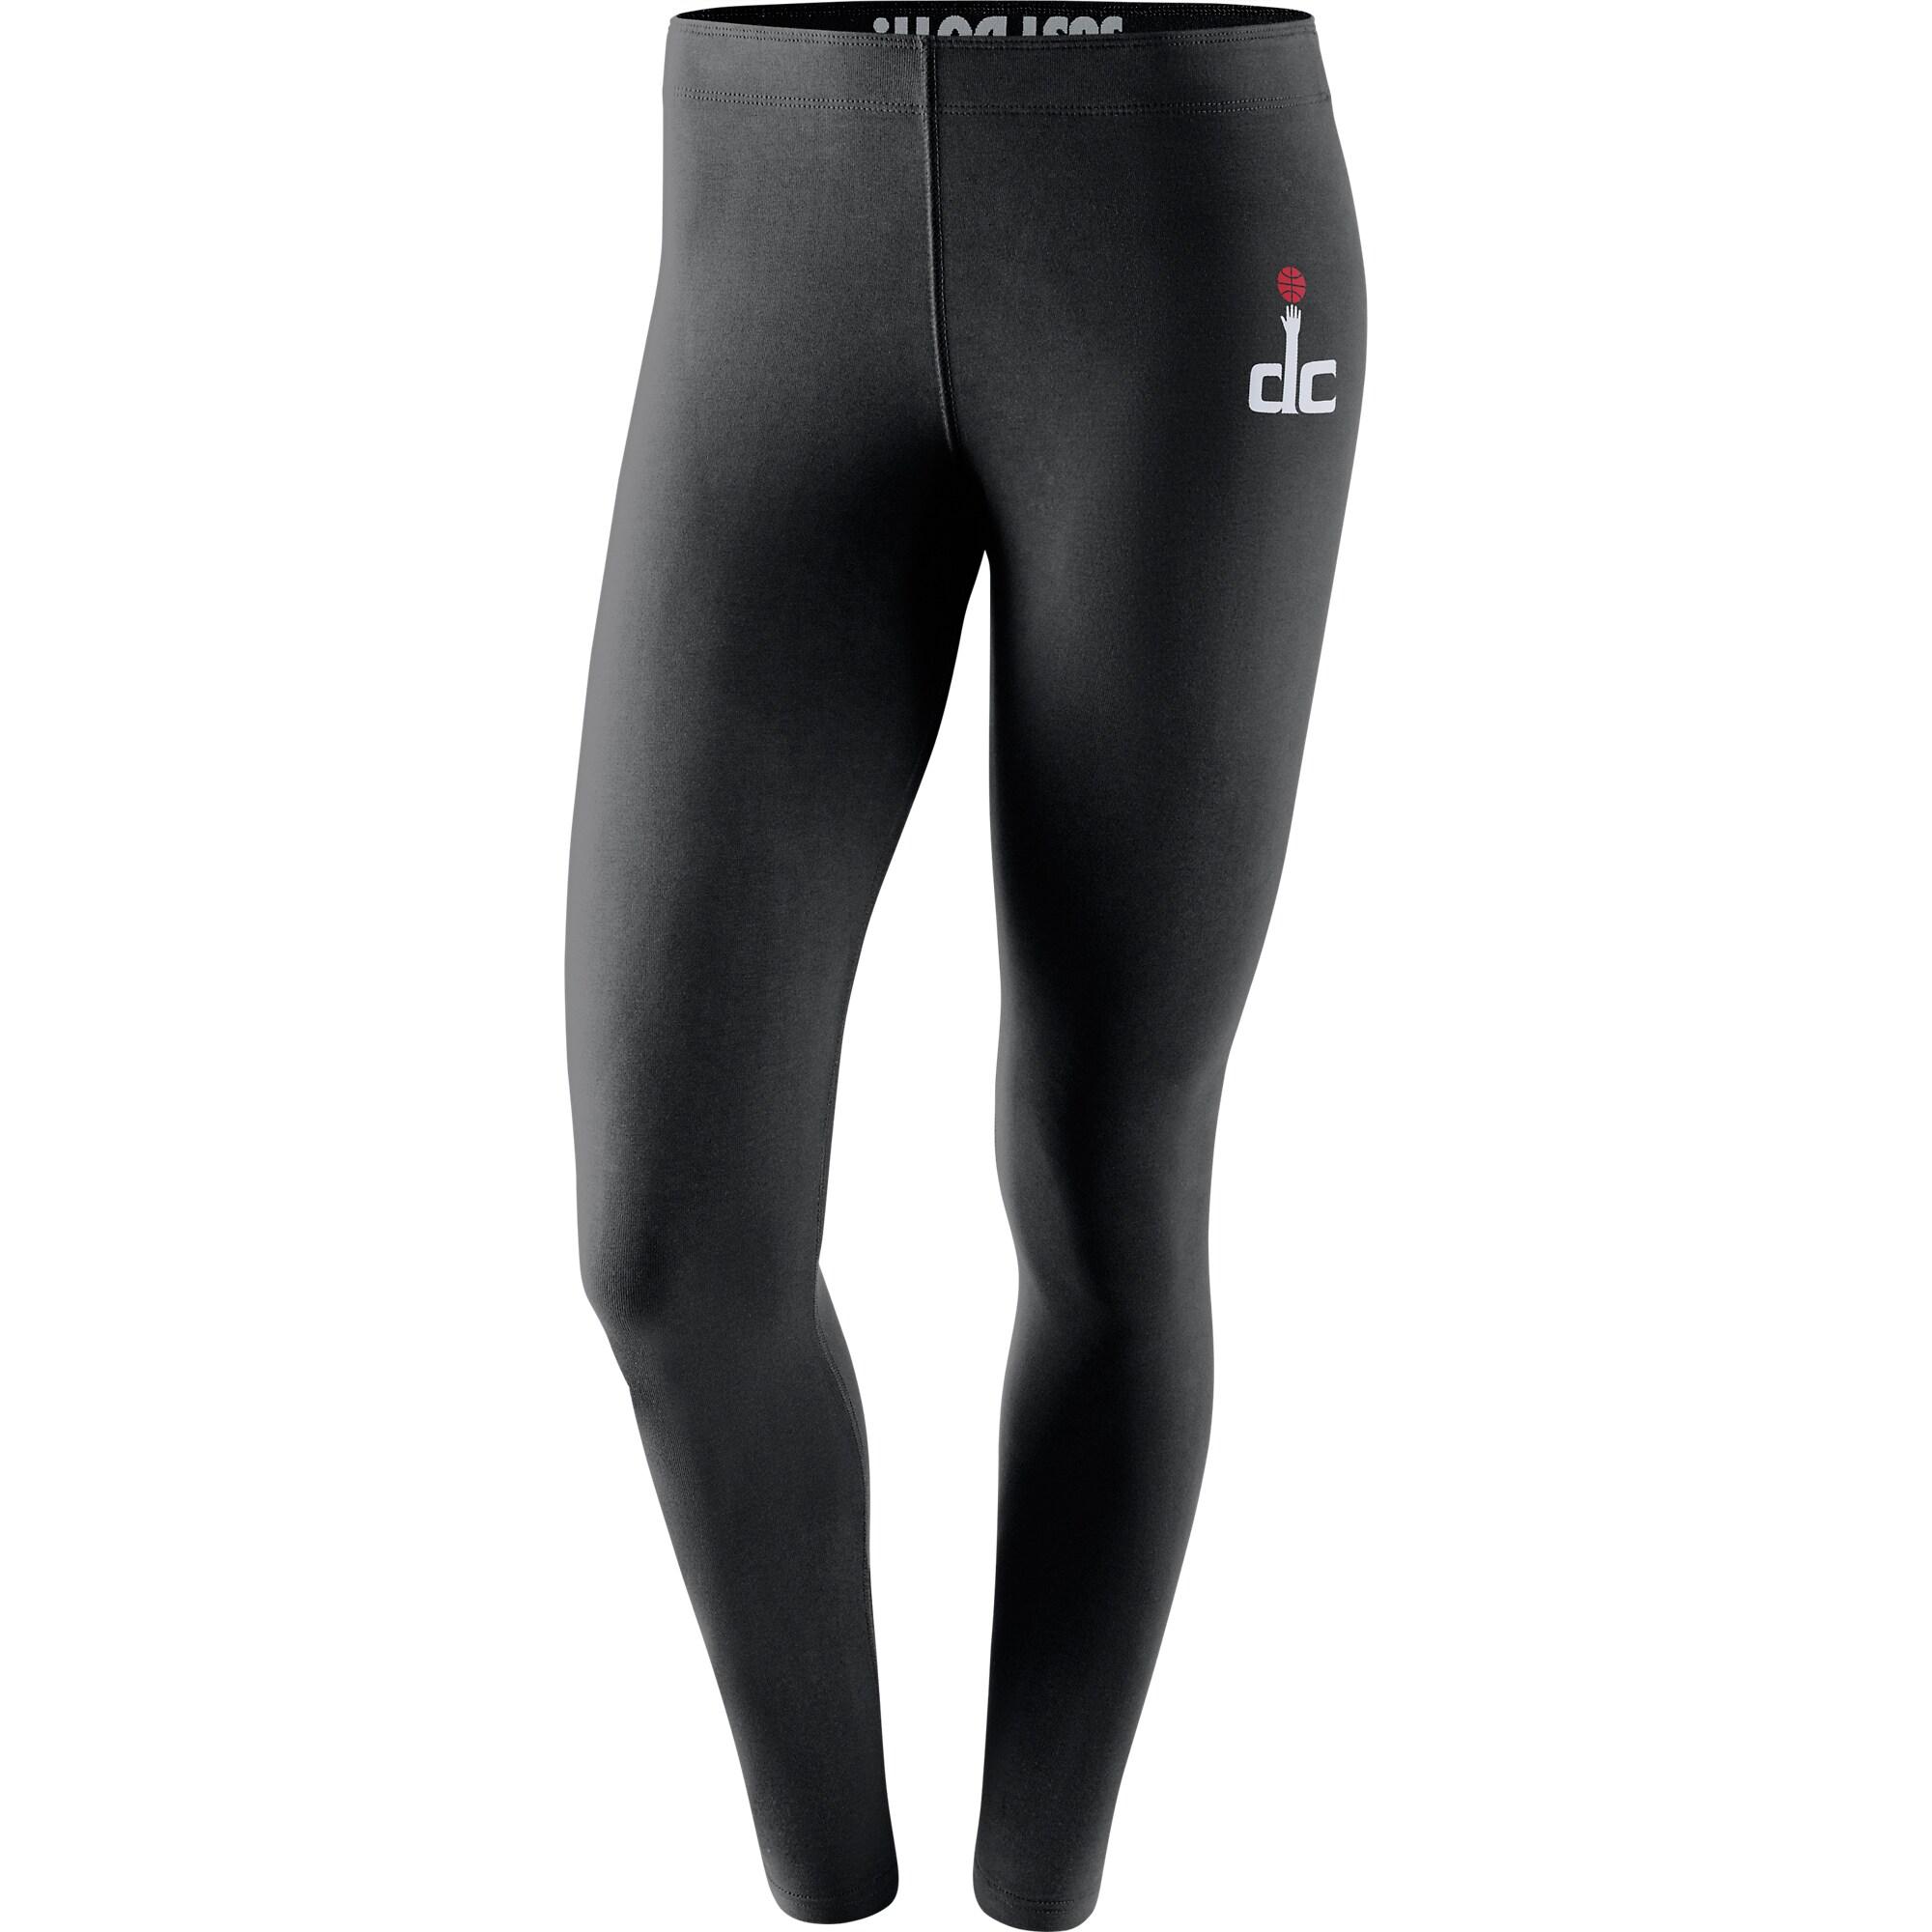 Washington Wizards Nike Women's Leg-A-See Tri-Blend Leggings - Black